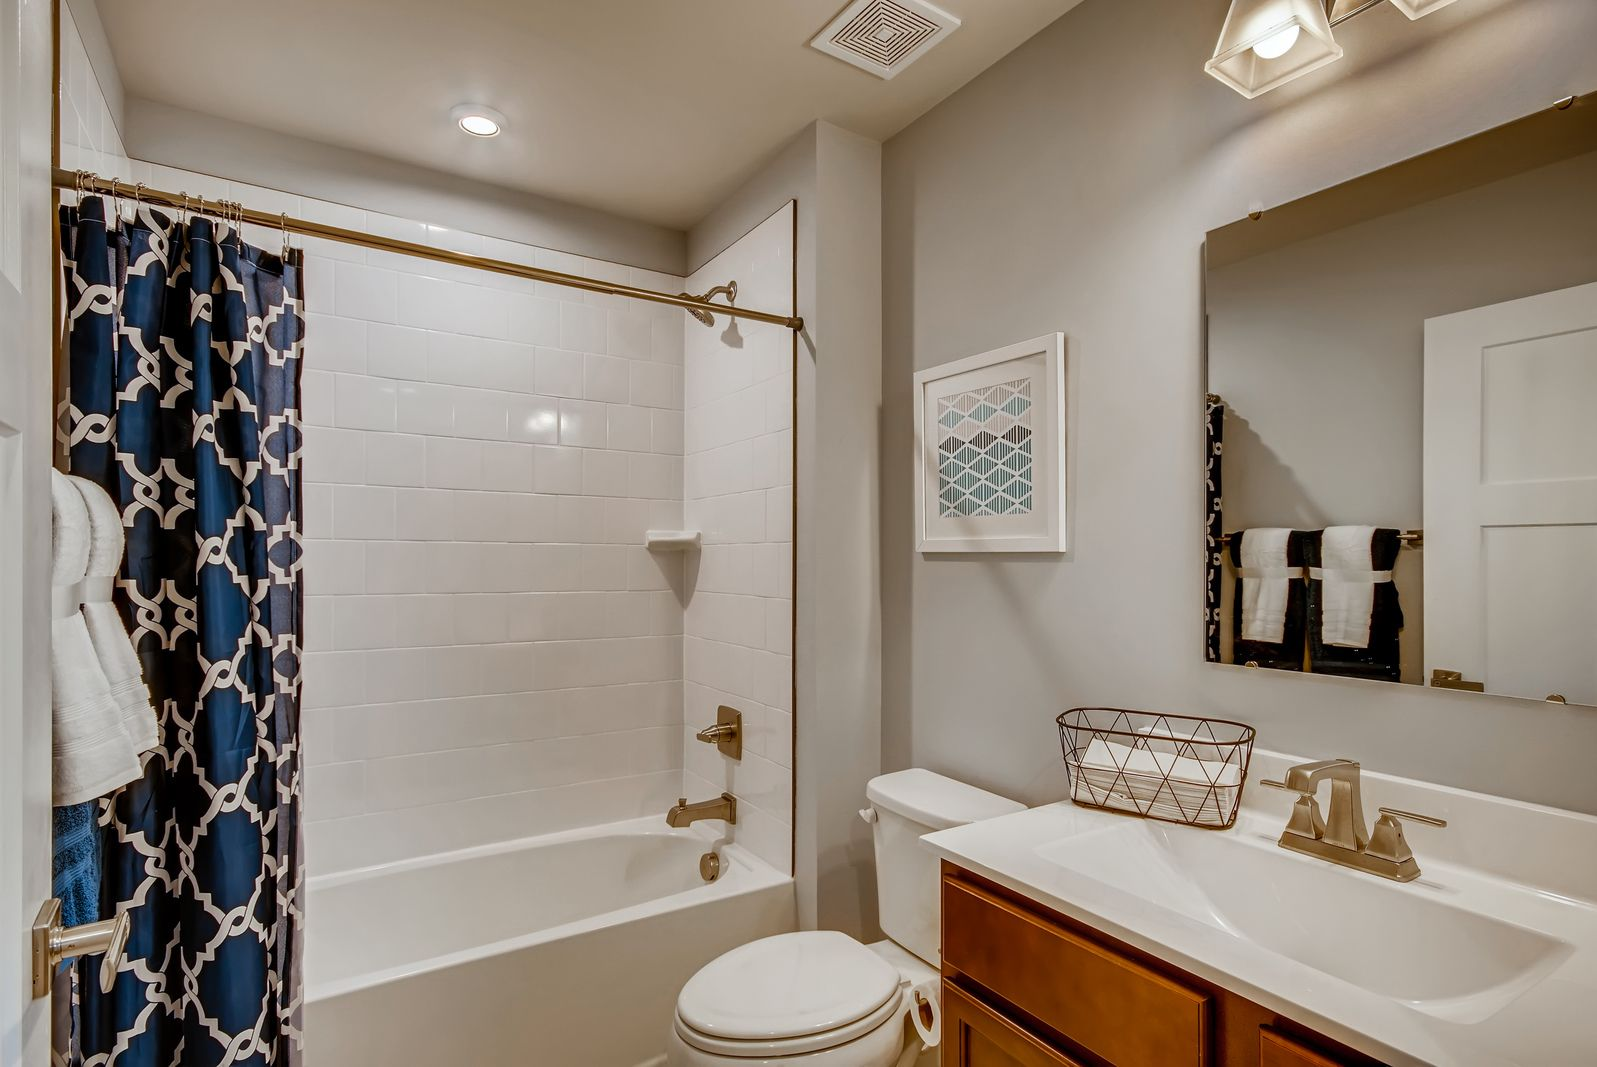 Bathroom featured in the Aruba By Ryan Homes in Cincinnati, OH